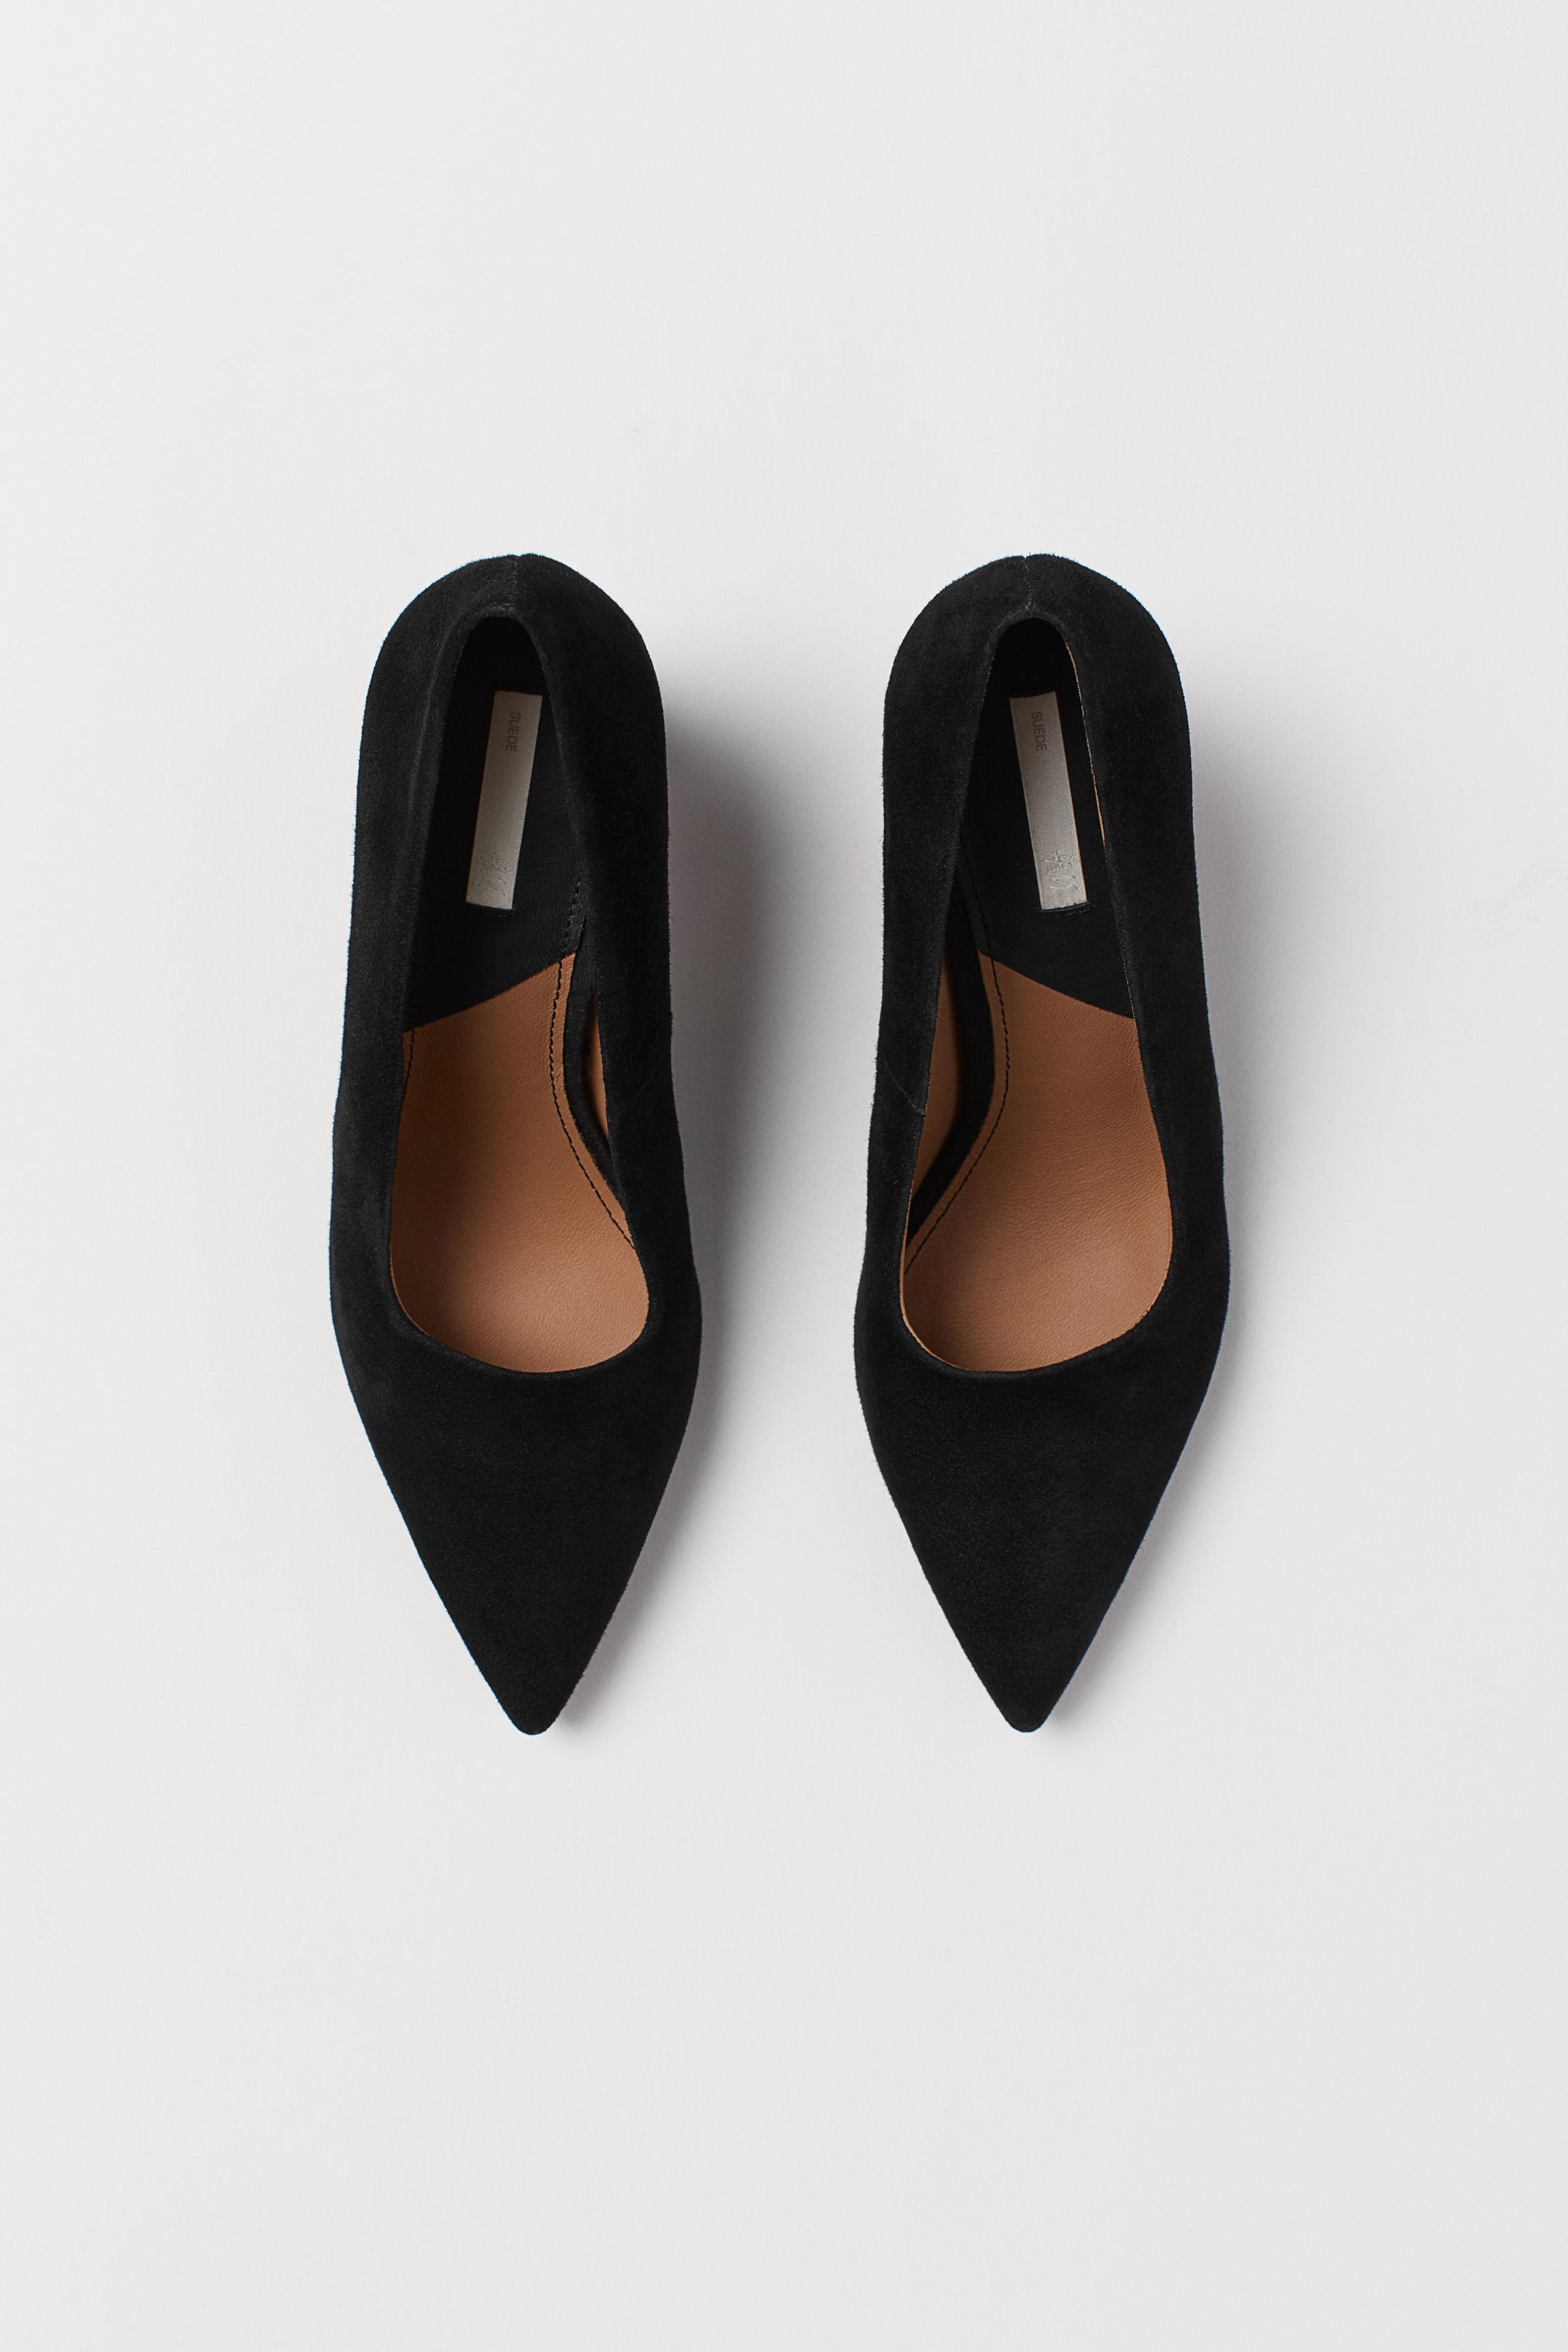 367b5ac4478 Block-heeled court shoes - Black Crocodile-patterned - Ladies